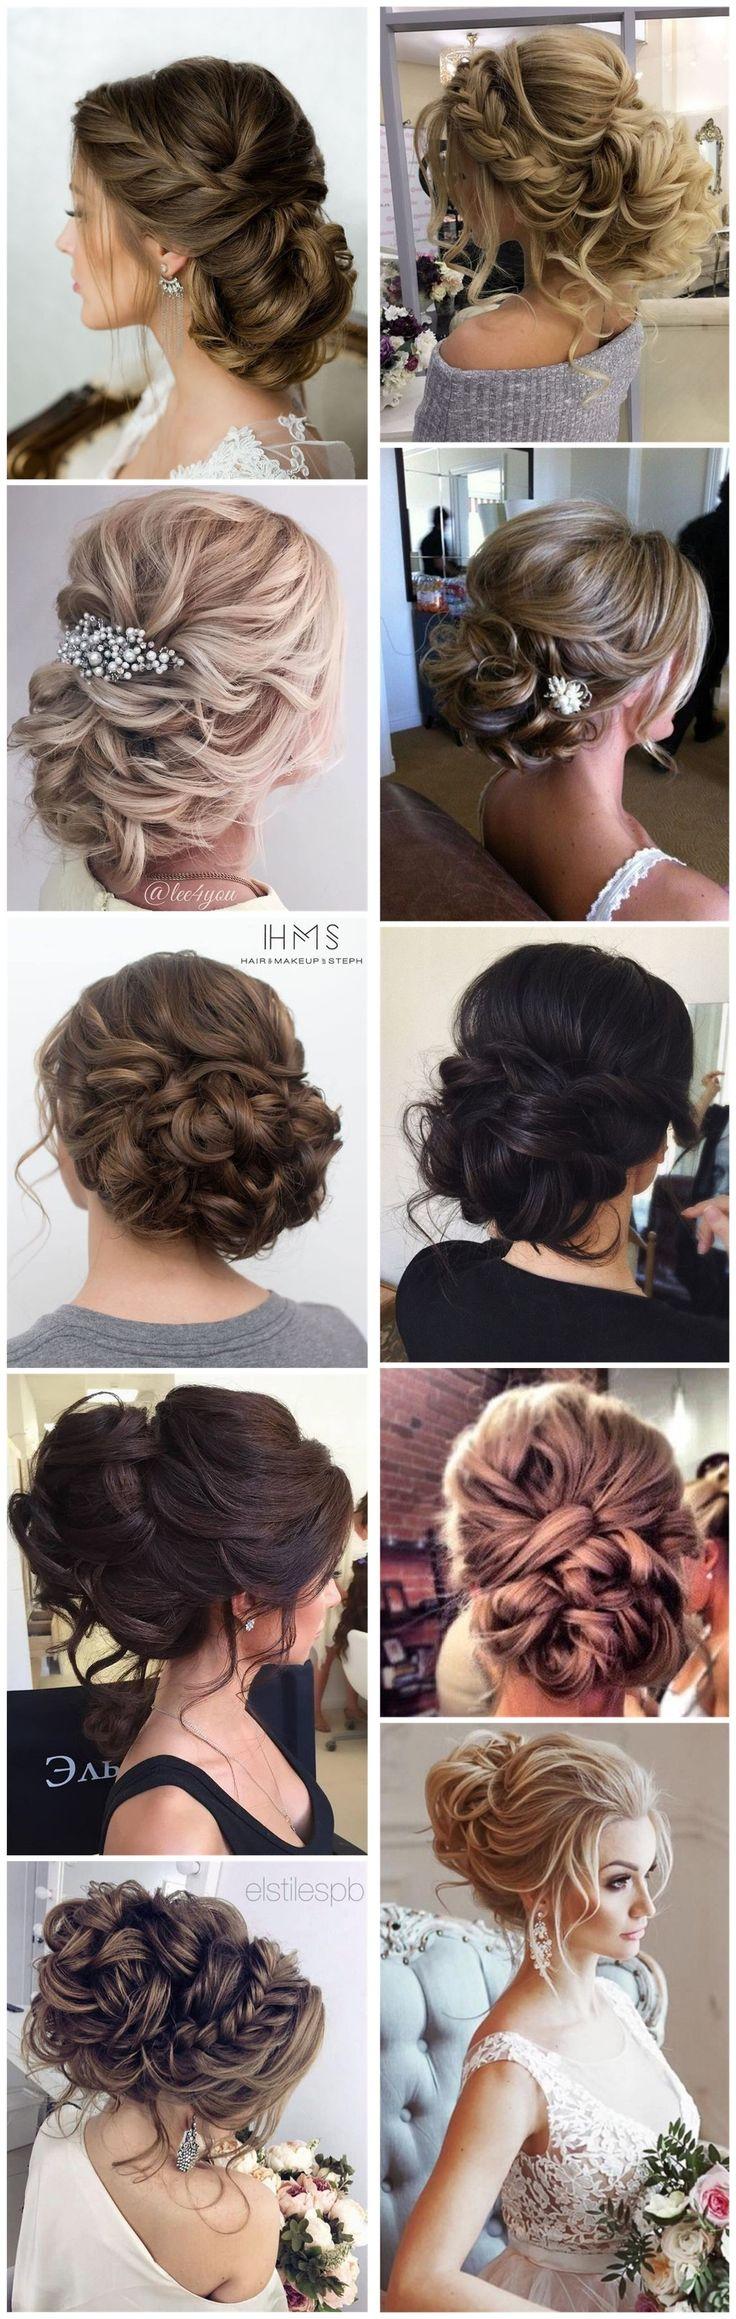 Best 25 Long Prom Hair Ideas On Pinterest Hair Styles